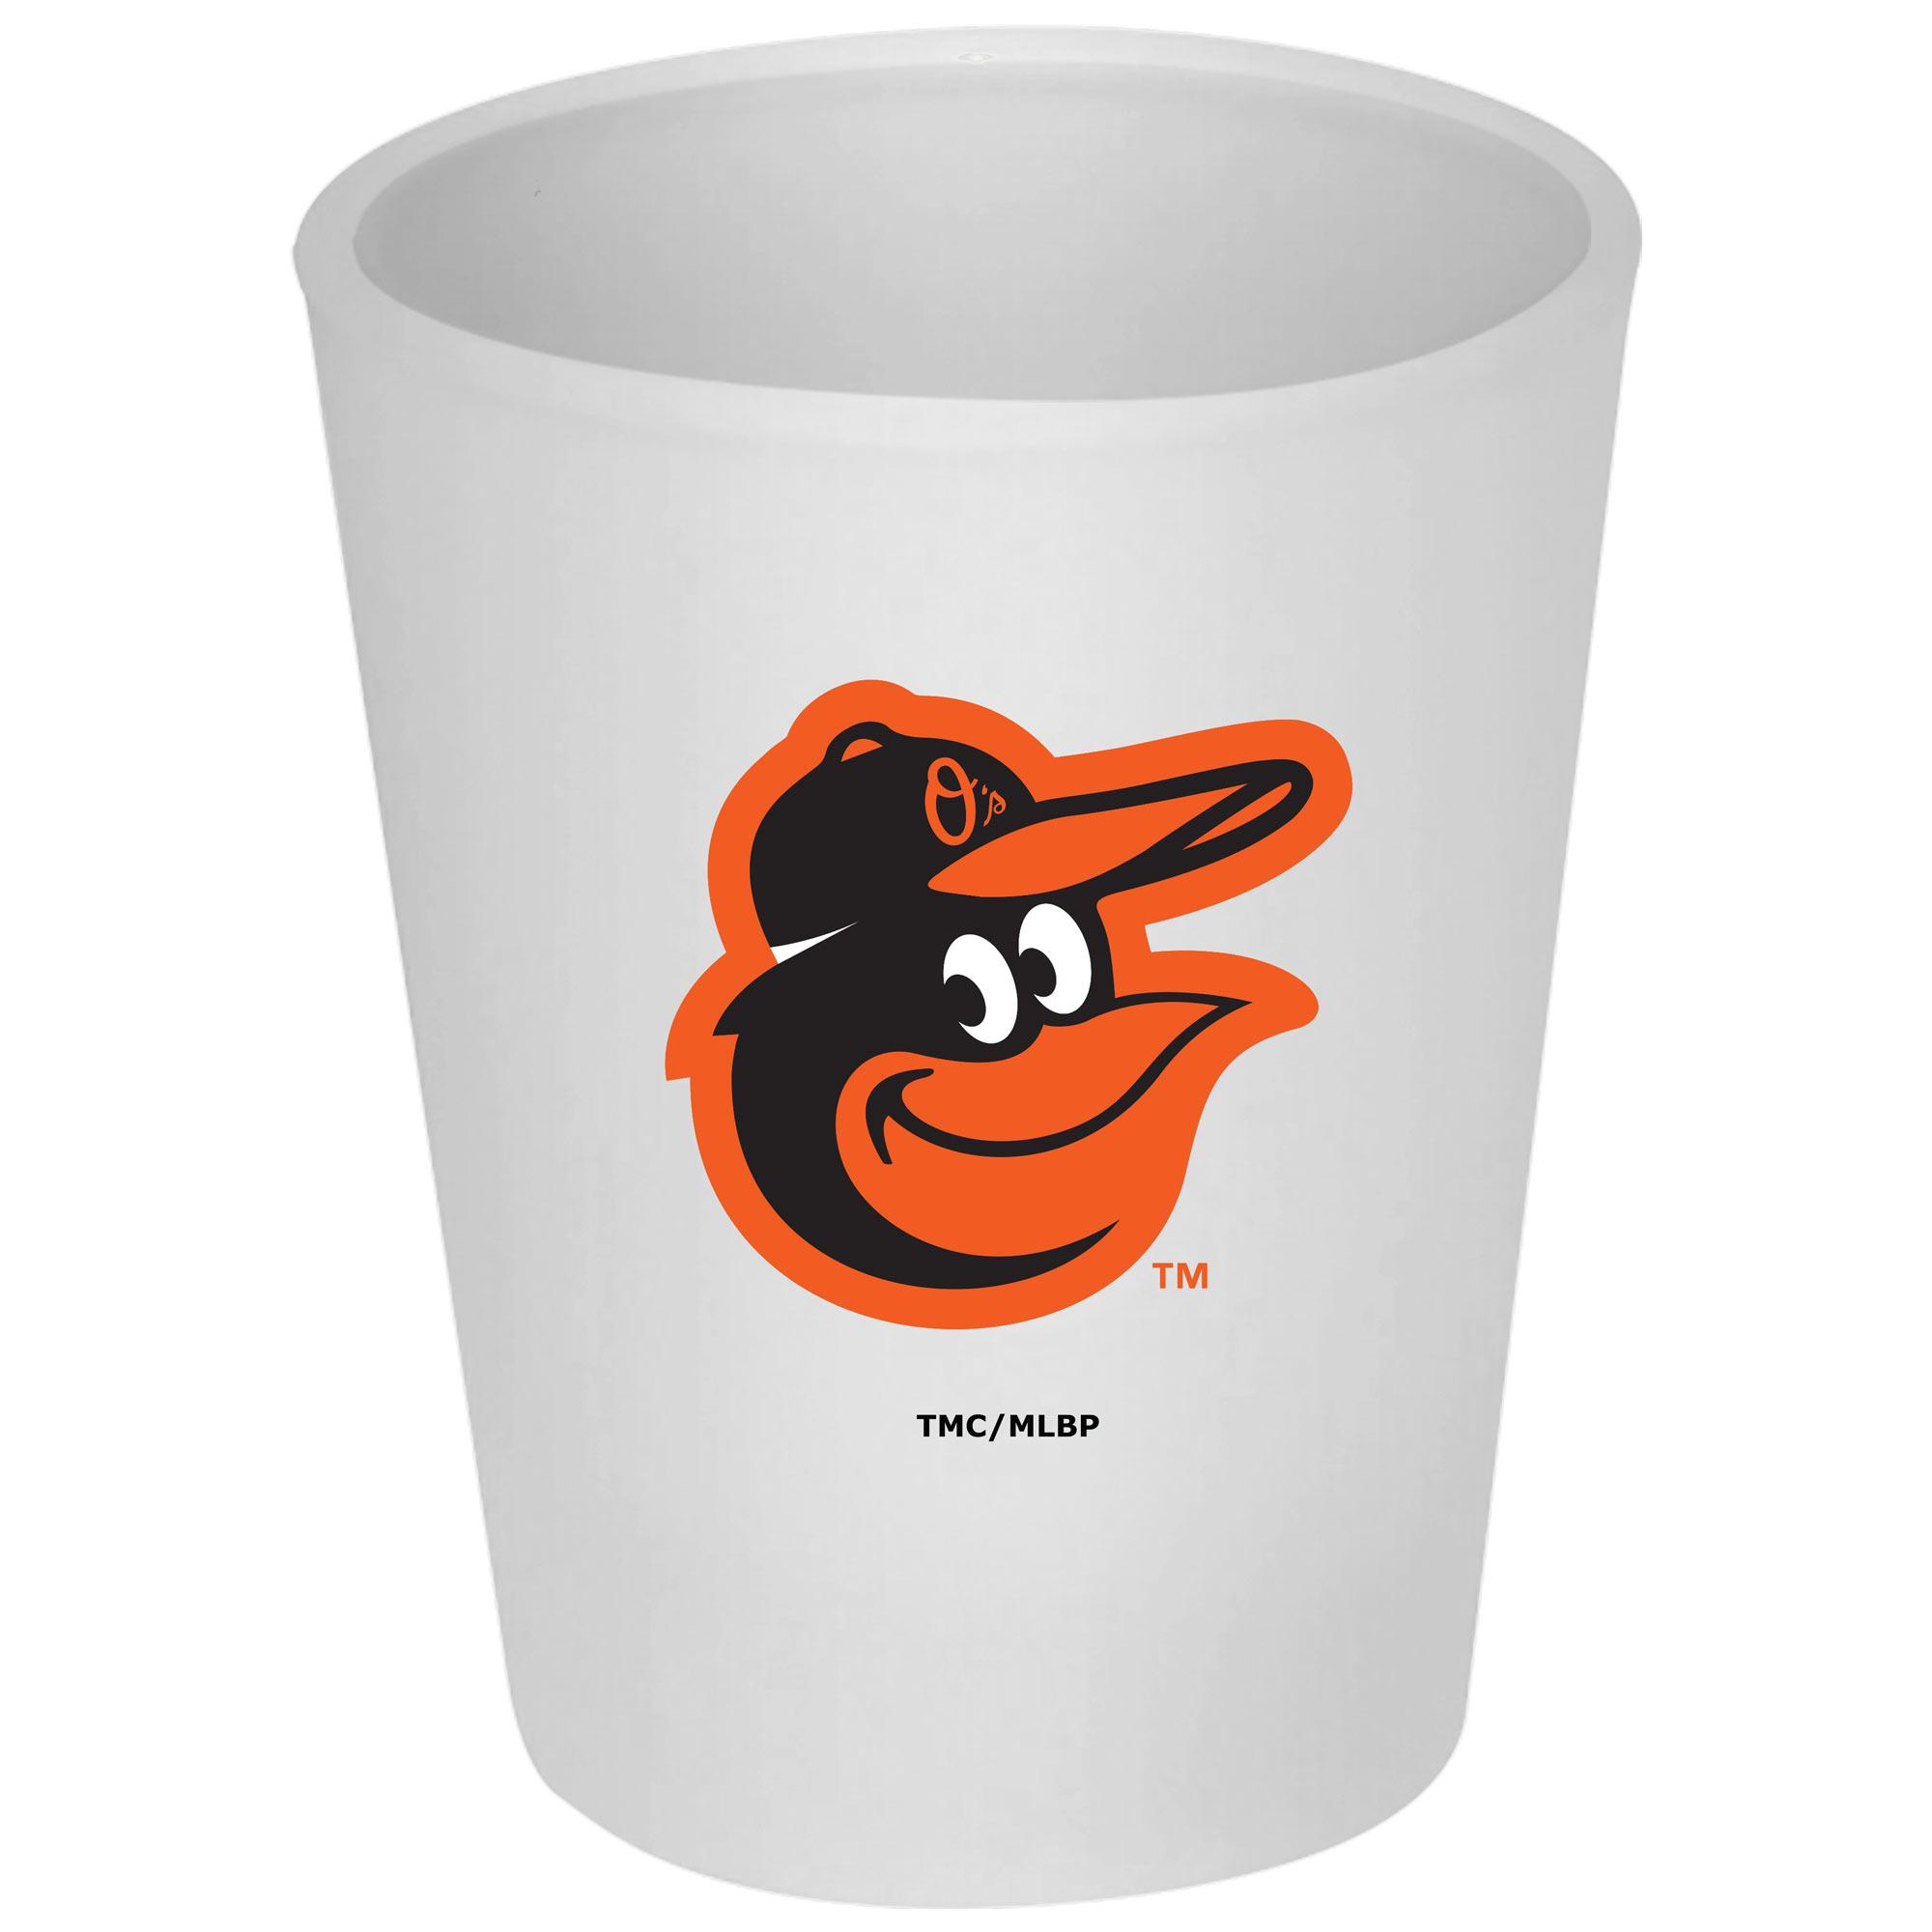 Baltimore Orioles 4.5oz. Frosted Souvenir Glass - No Size